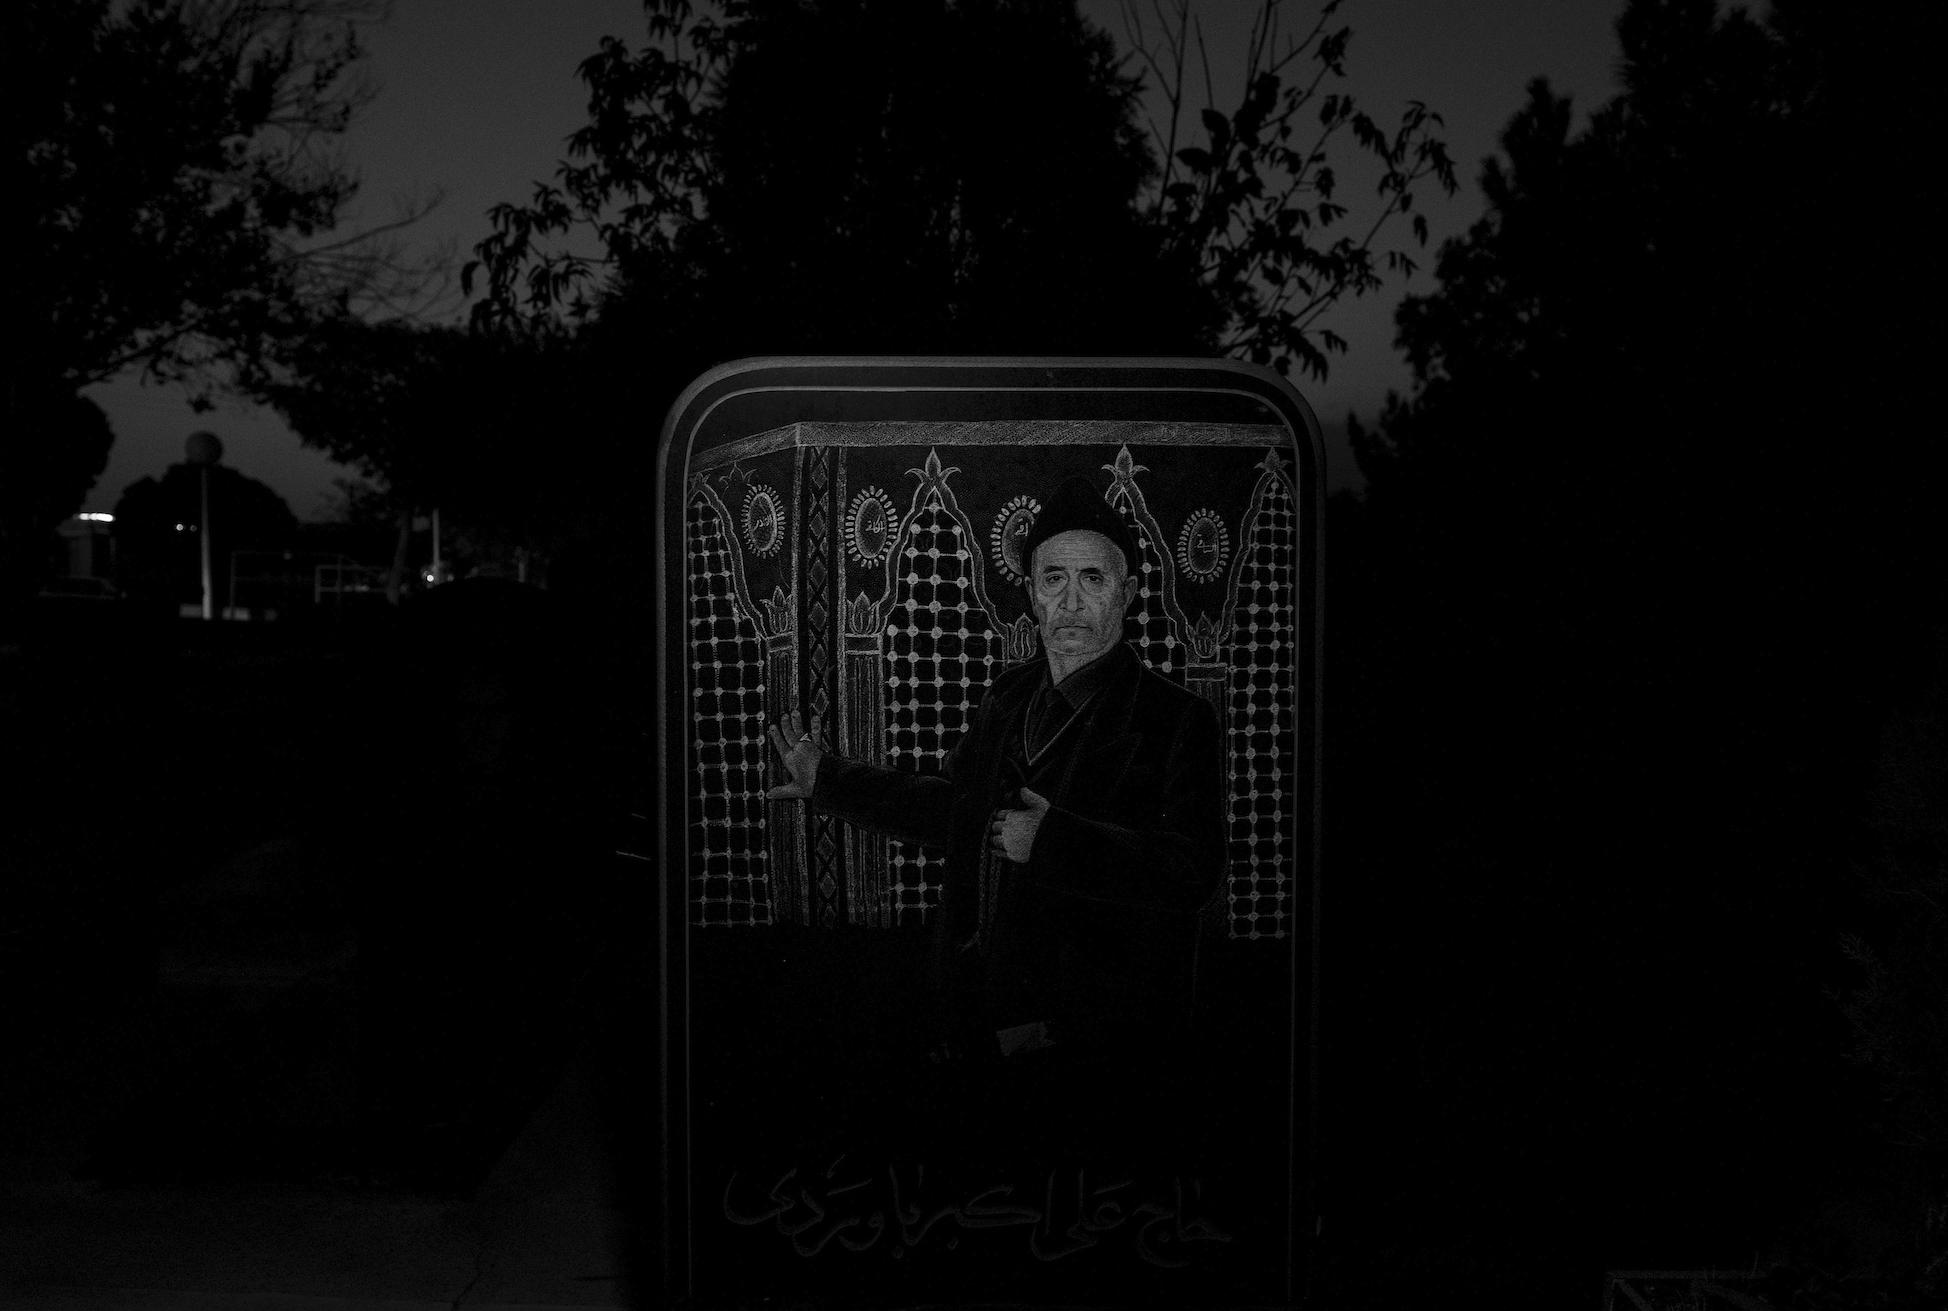 Sajed Haqshenas - Tabriz Cemtery - Photodigi (2)